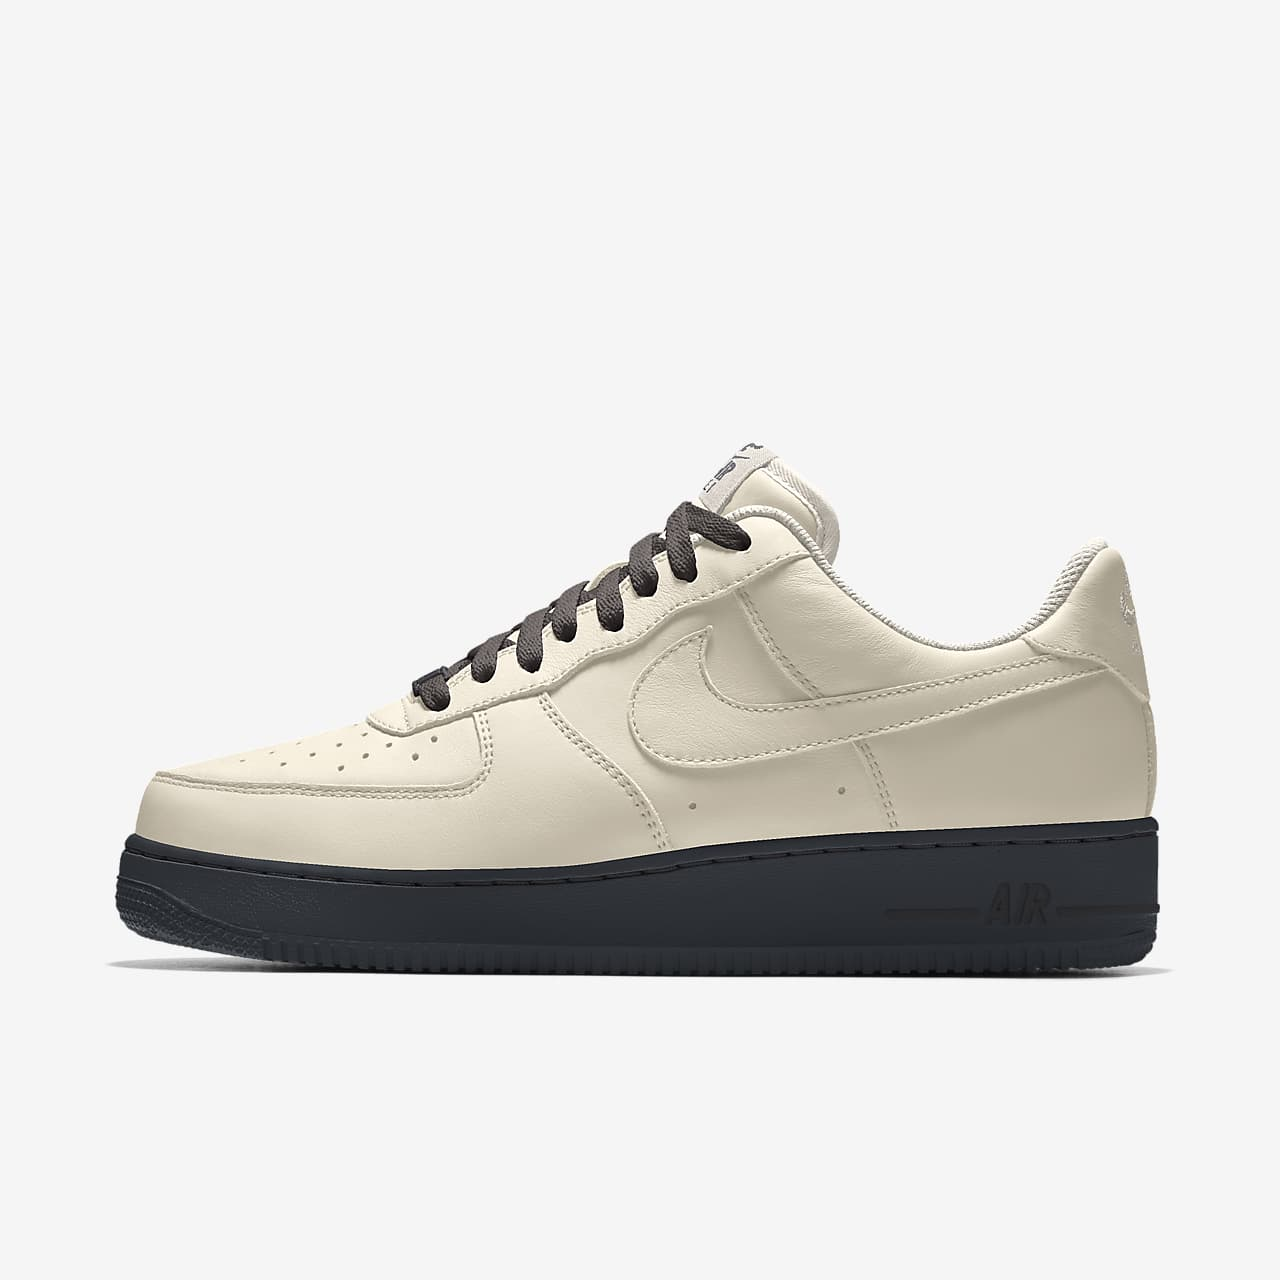 Nike Air Force 1 Low By You Custom Men's Shoe